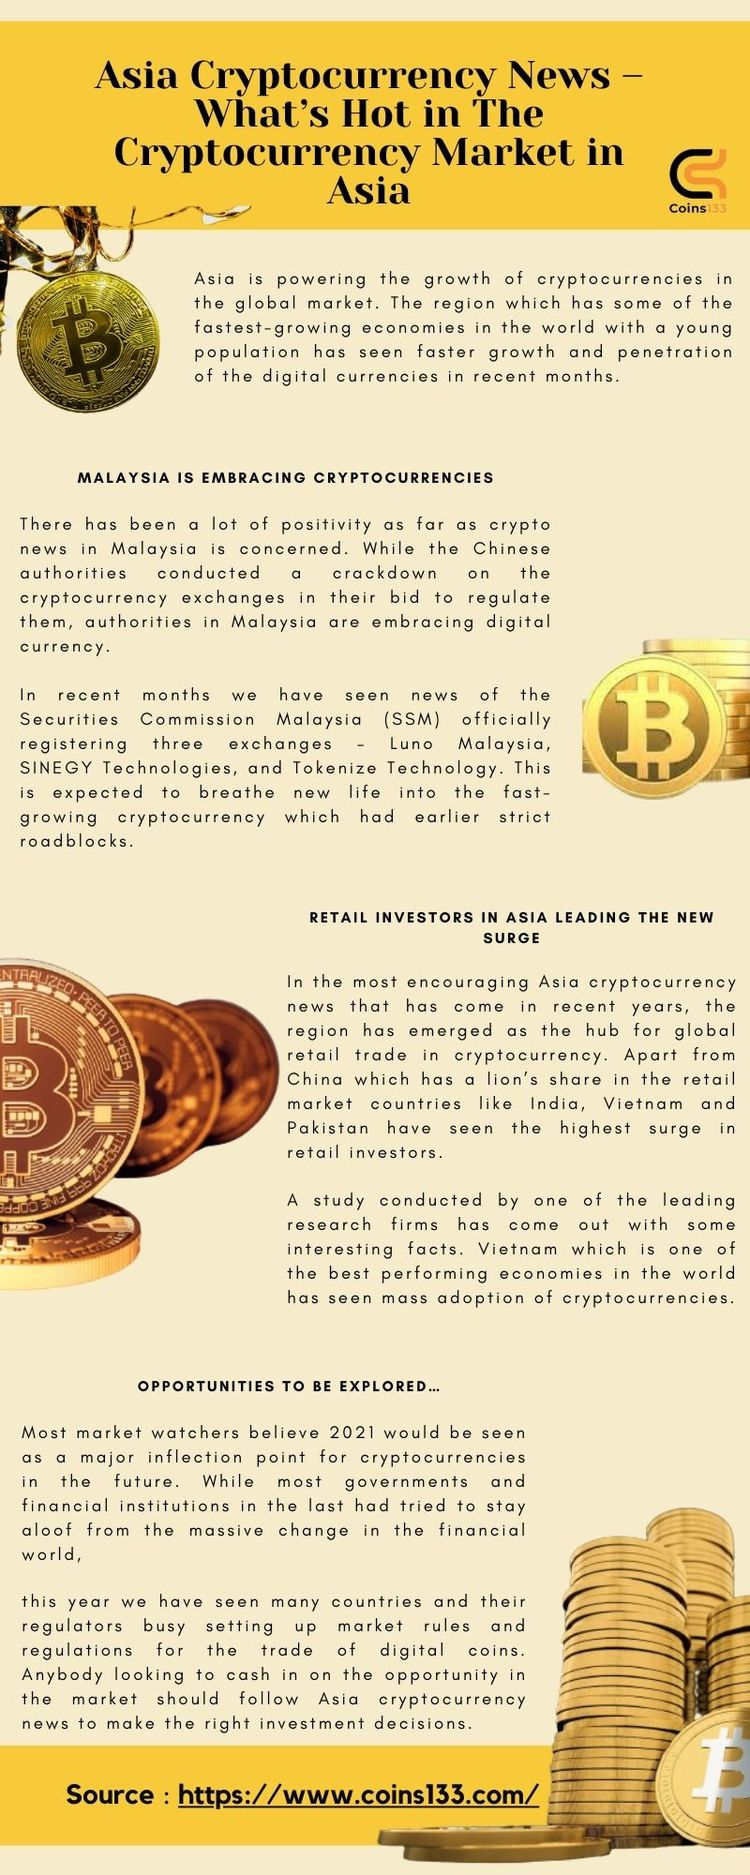 spending lot time money cryptoc - coins133 | ello